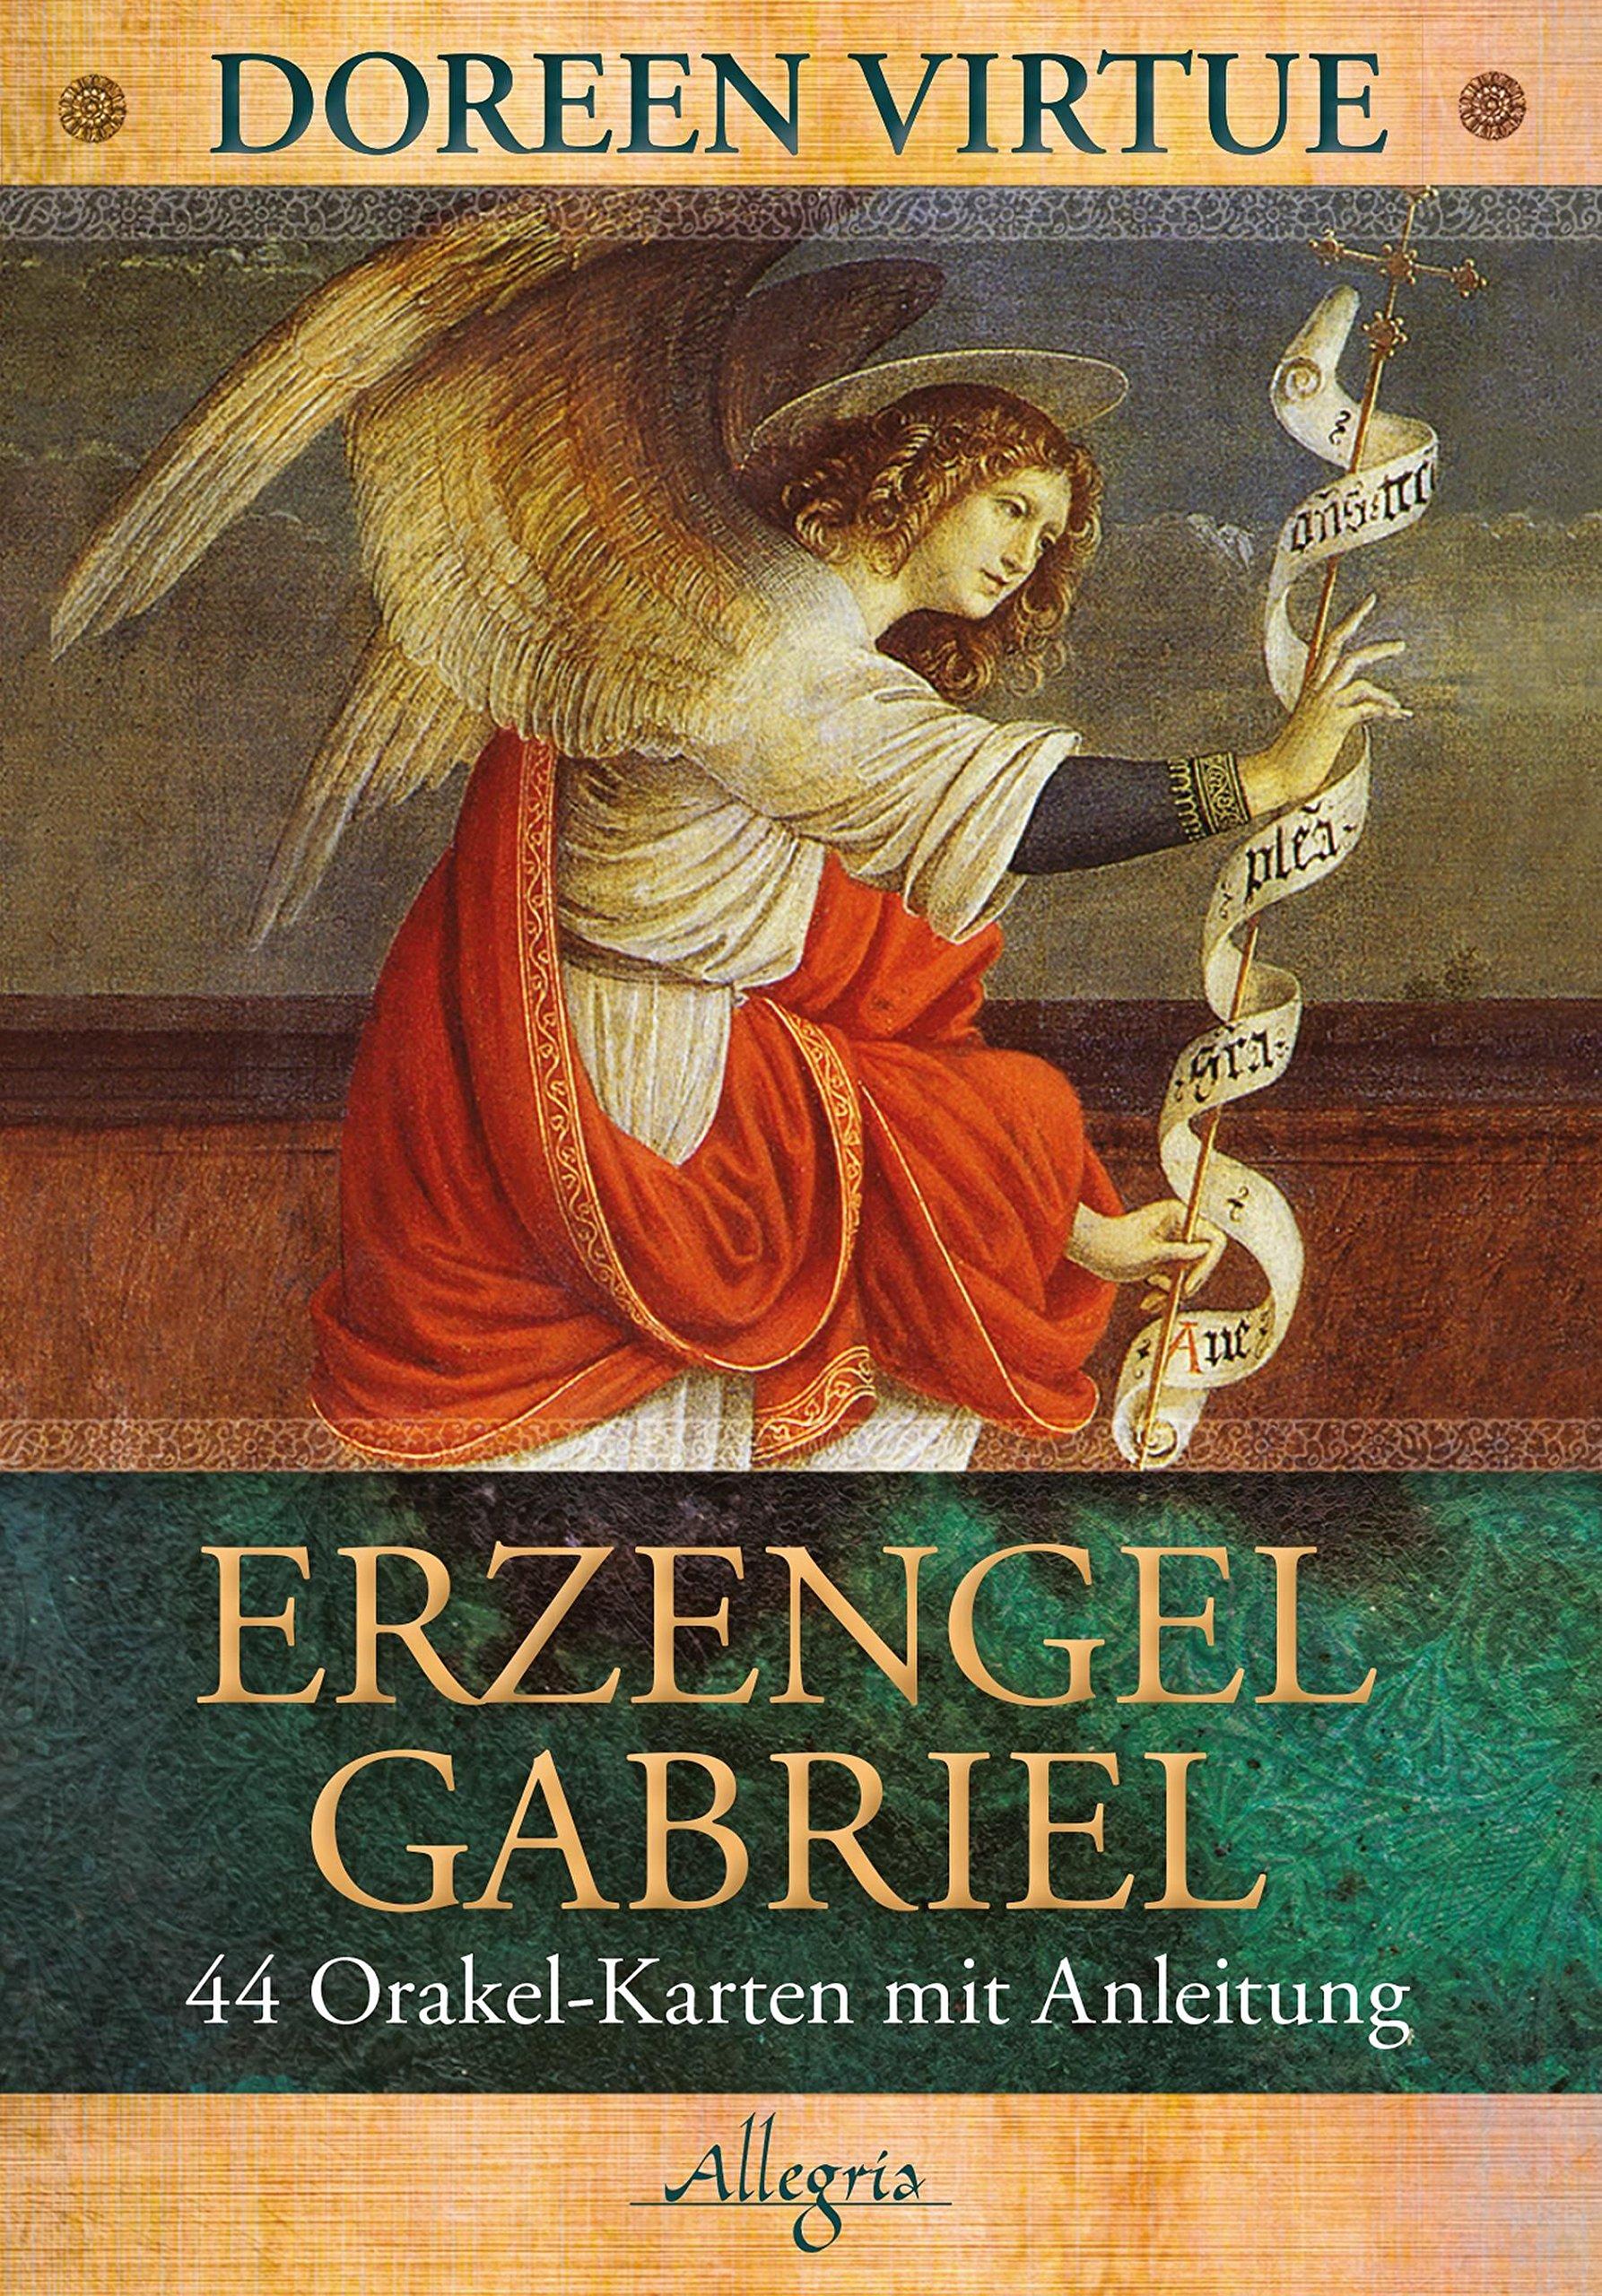 Erzengel Gabriel: 44 Orakel-Karten mit Anleitung